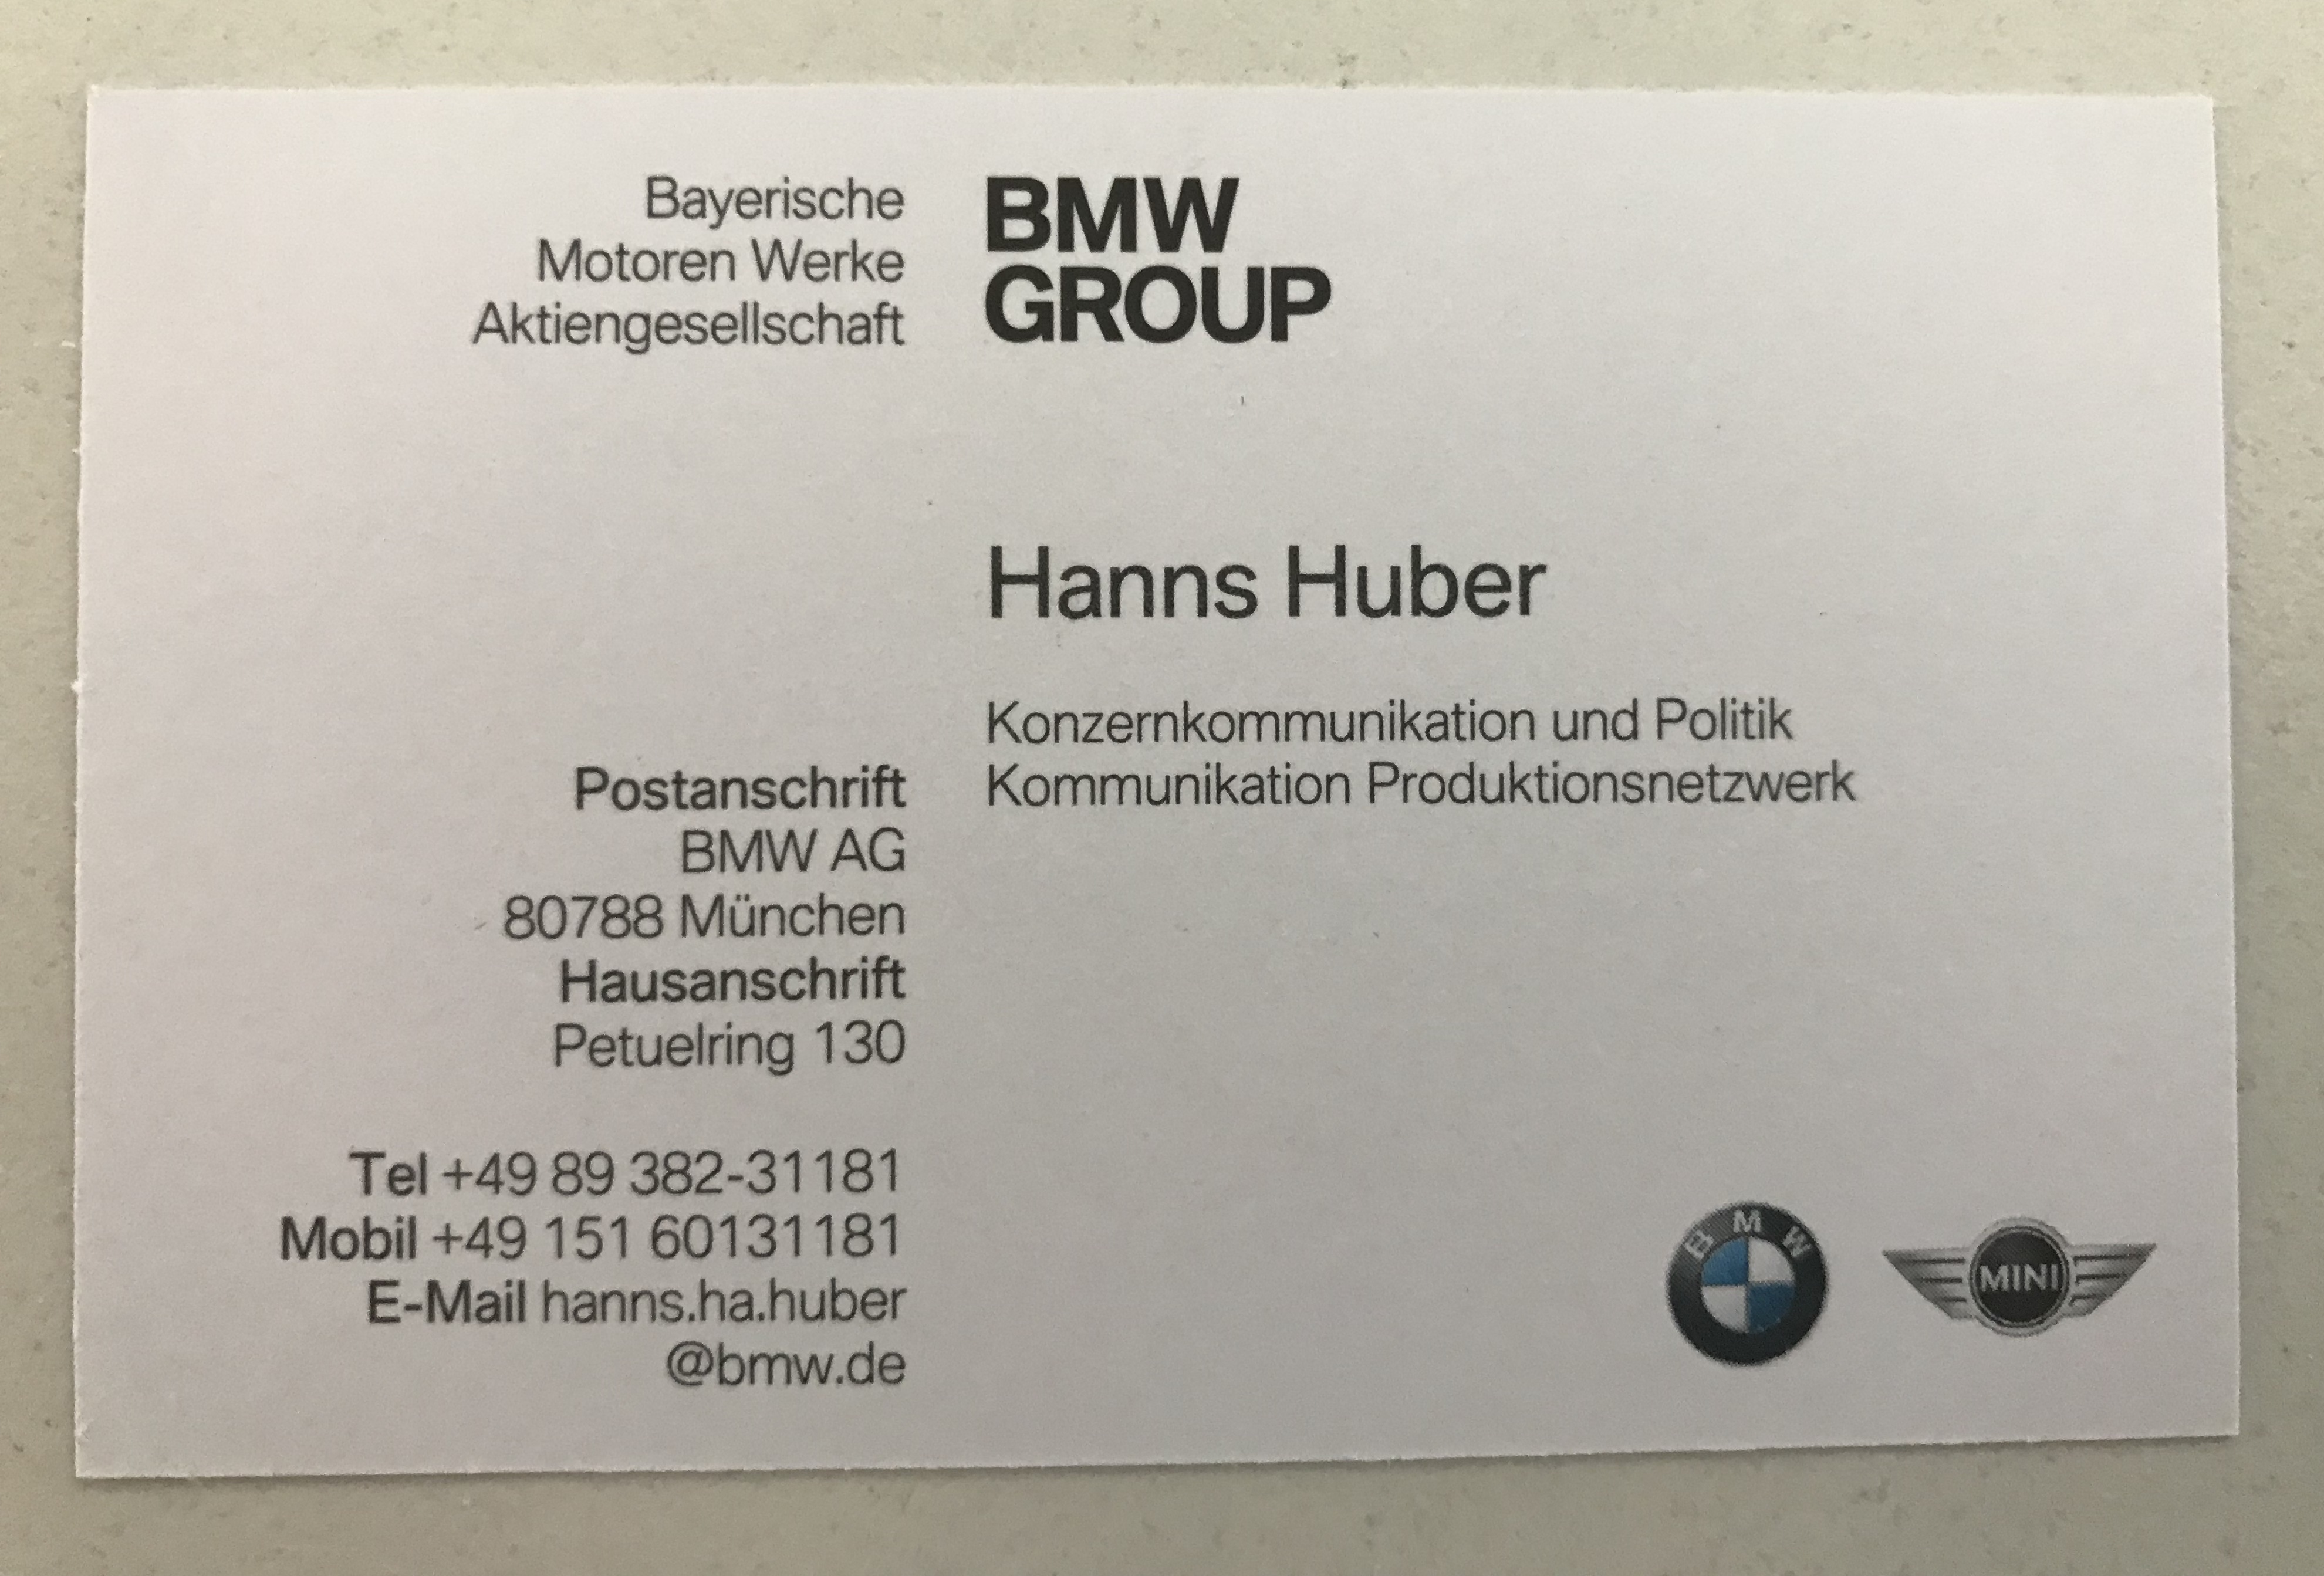 Datei Visitenkarte Hanns Huber Bmw Group Jpg Wikipedia